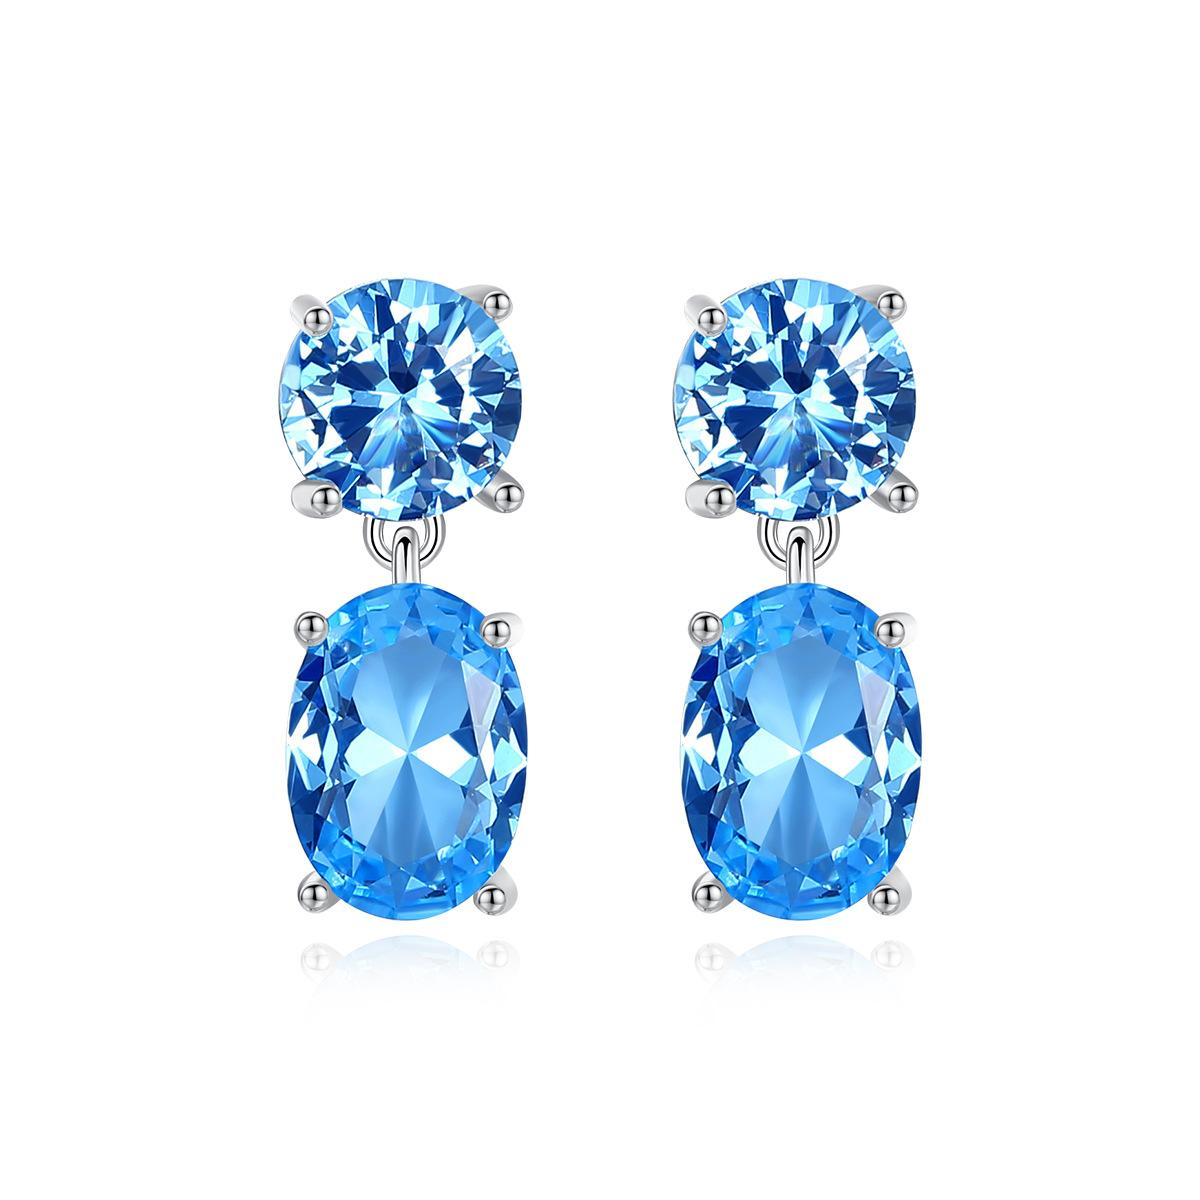 Luxo Topázio Azul Gota Brincos para Mulheres Wedding Engagement Fine Jewelry Prata Brincos Joyeria Fina Para Mujer SE0432